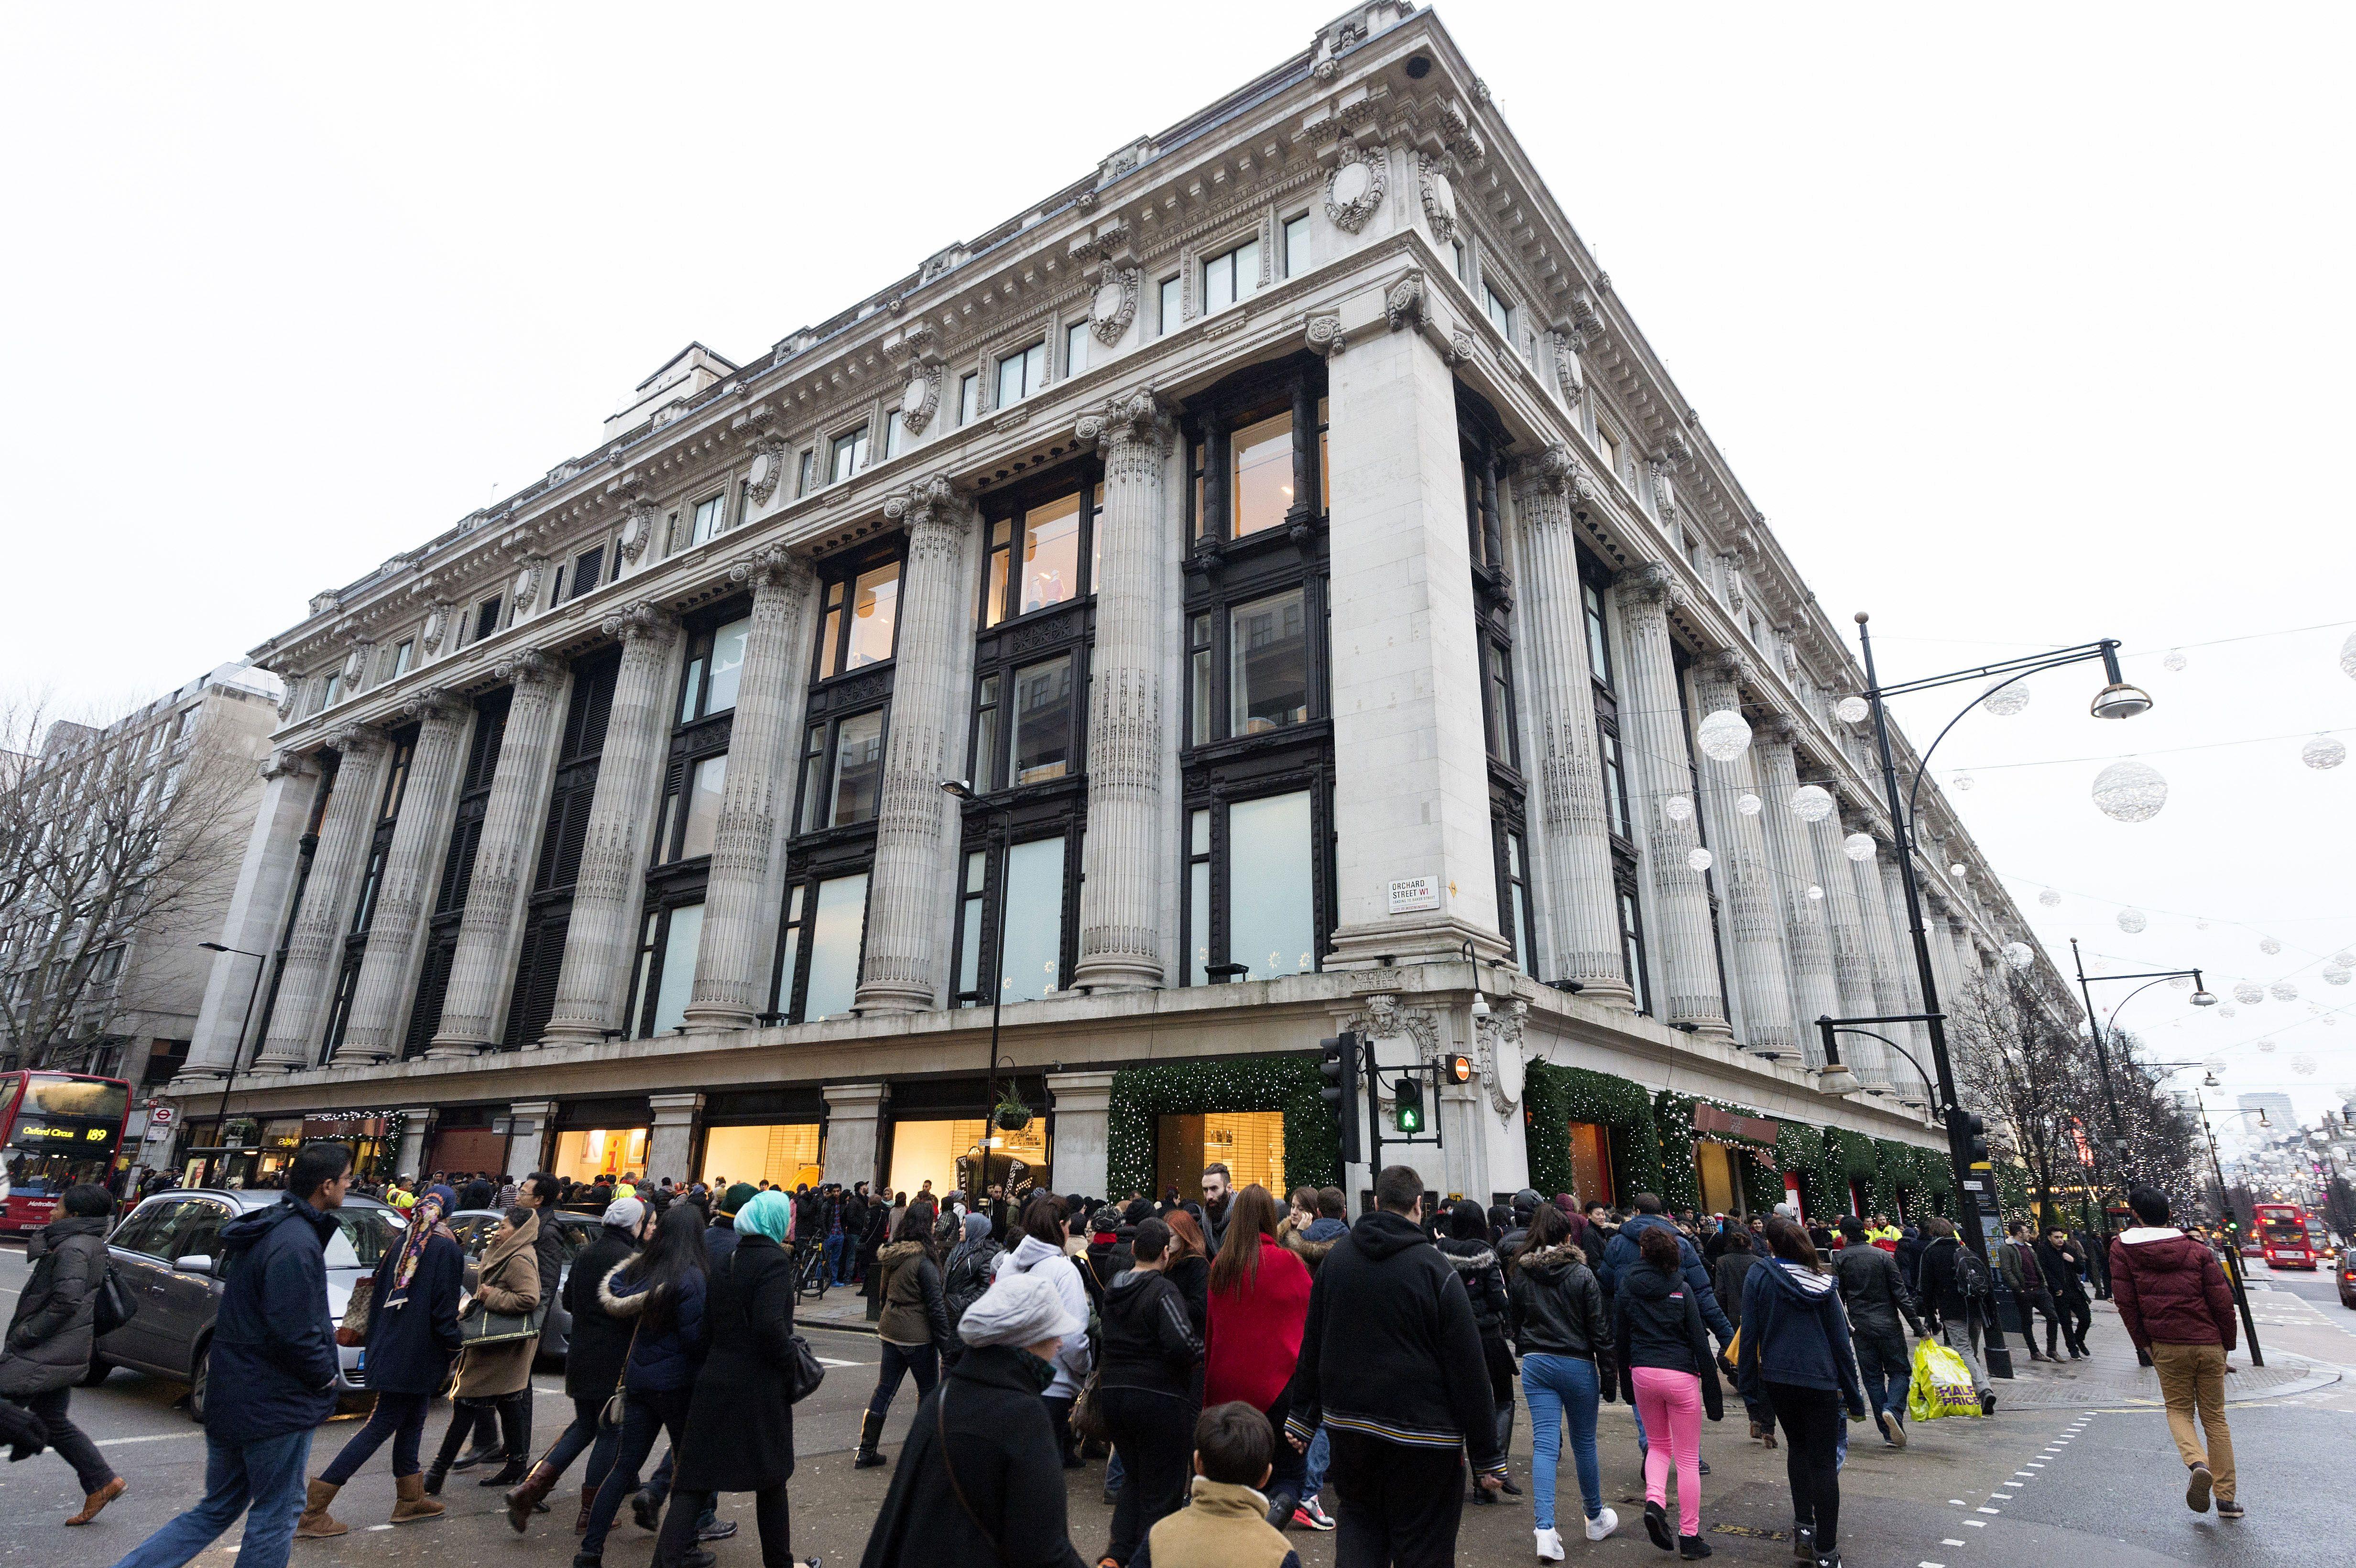 Selfridges Department Store